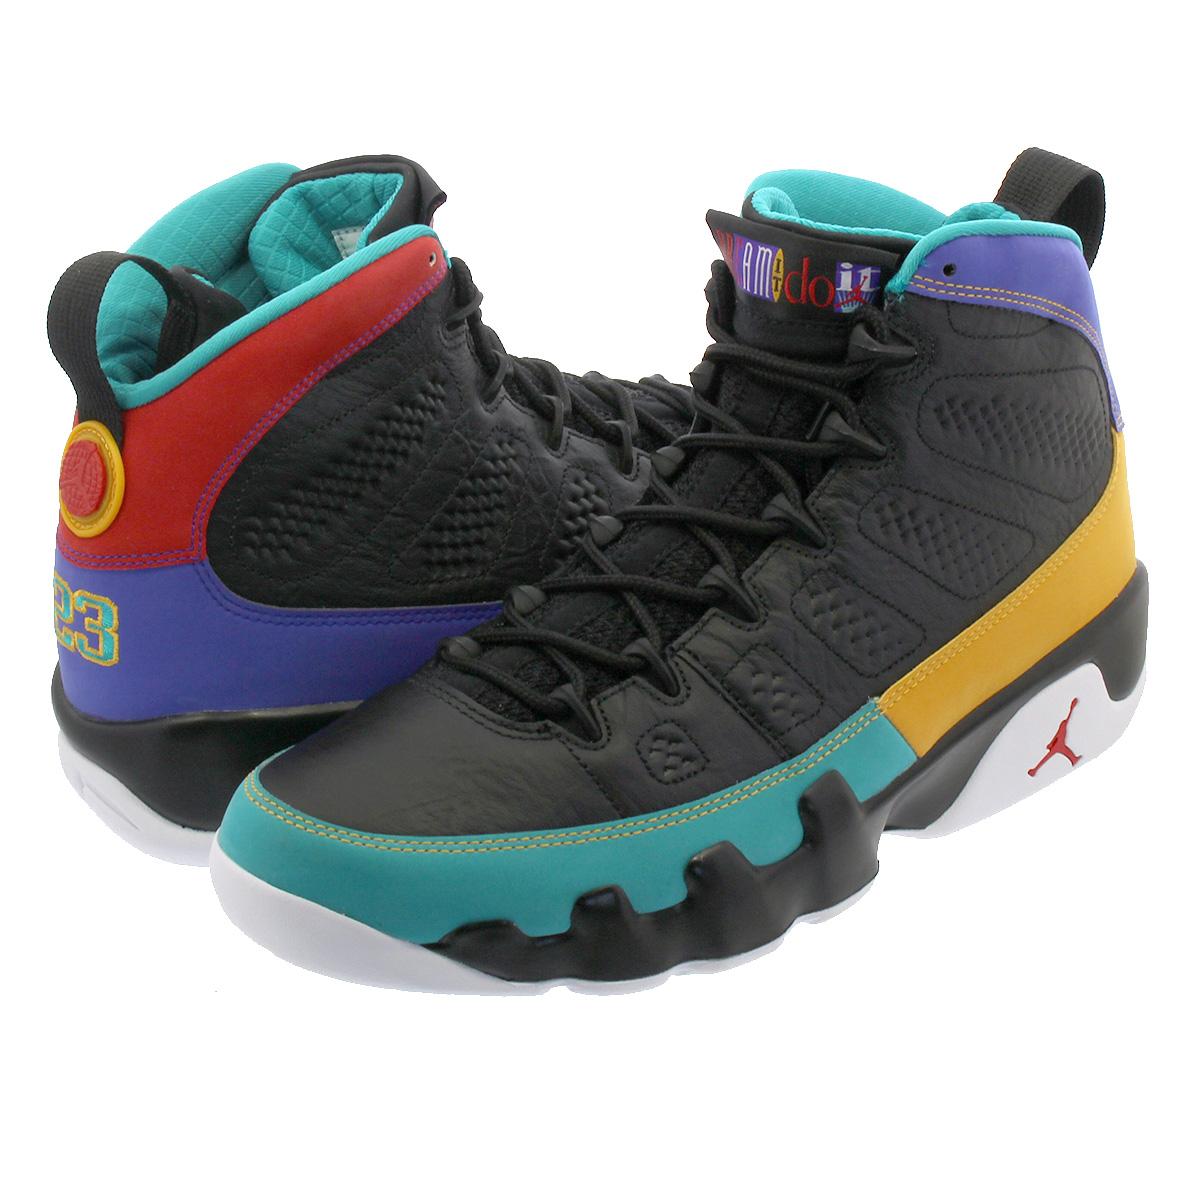 12e730be444 NIKE AIR JORDAN 9 RETRO Nike air Jordan 9 nostalgic BLACK/UNIVERSITY RED/ DARK ...